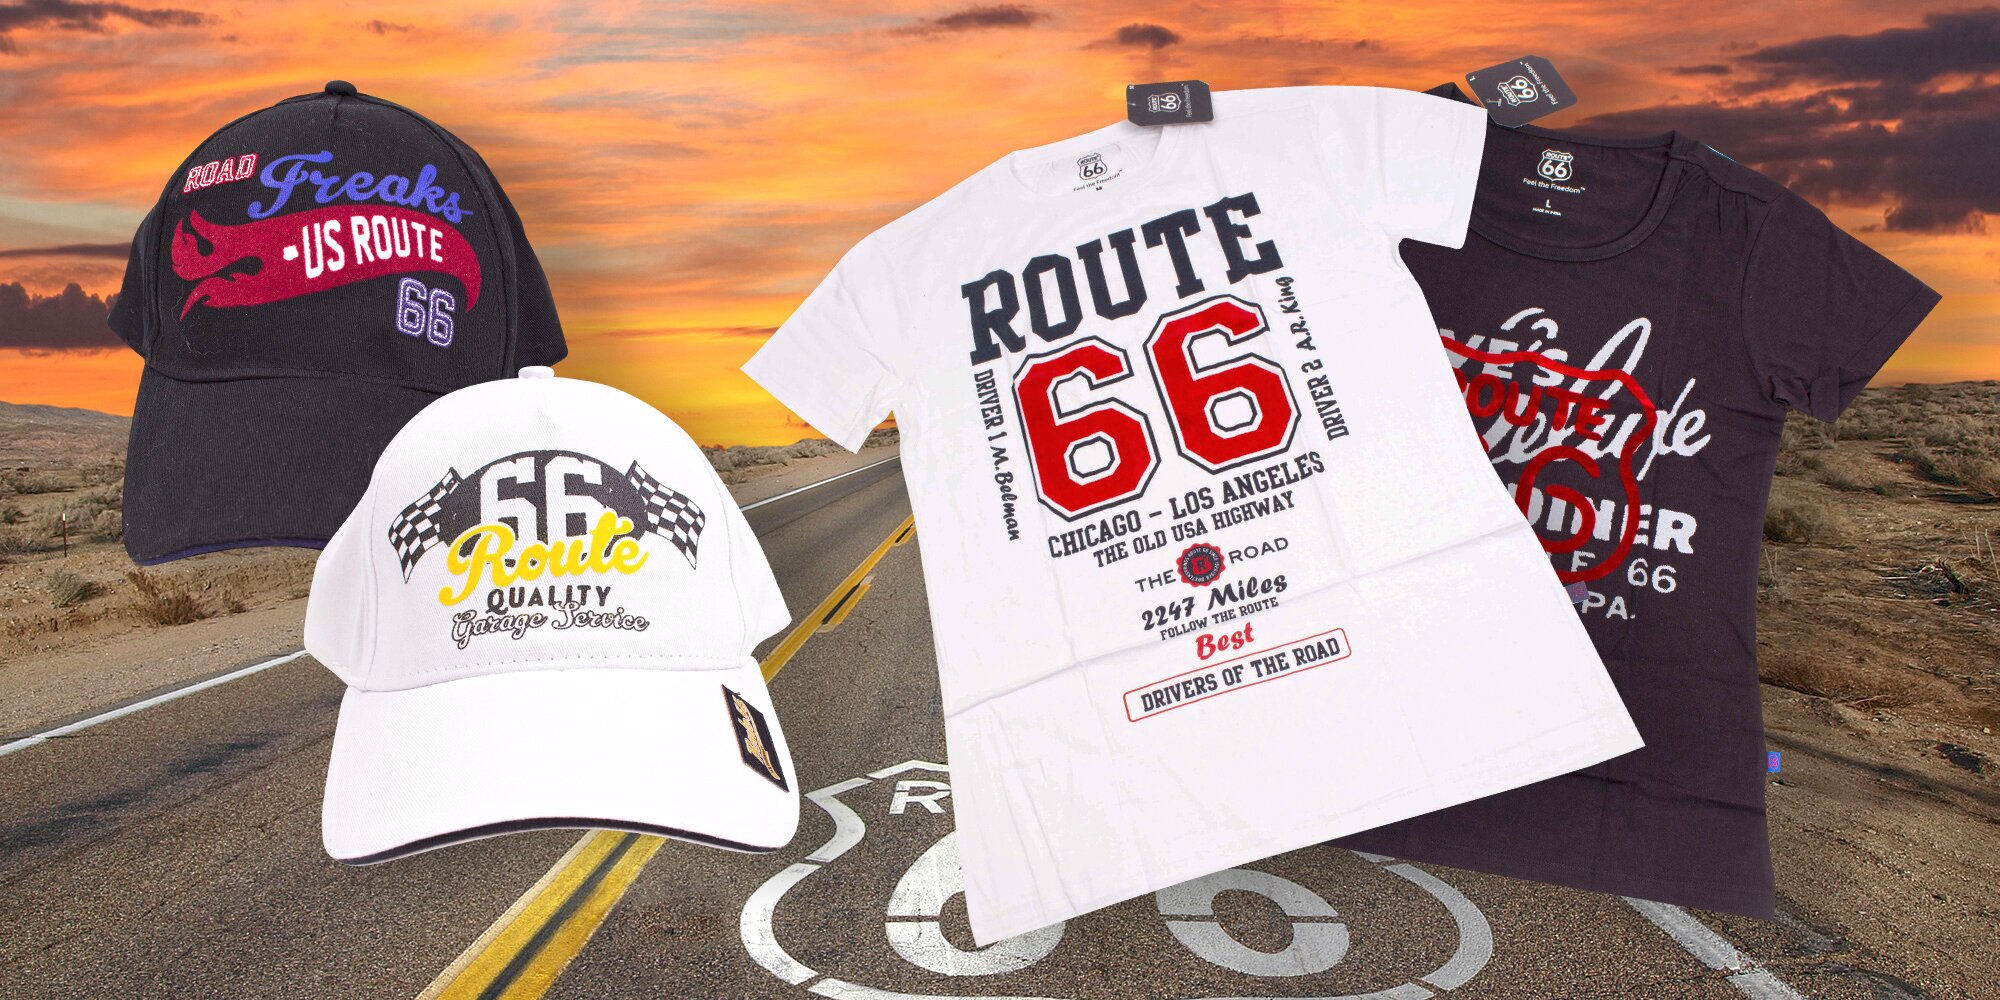 41a5b7c75e0 Dámská i pánská trička a kšiltovky Route 66